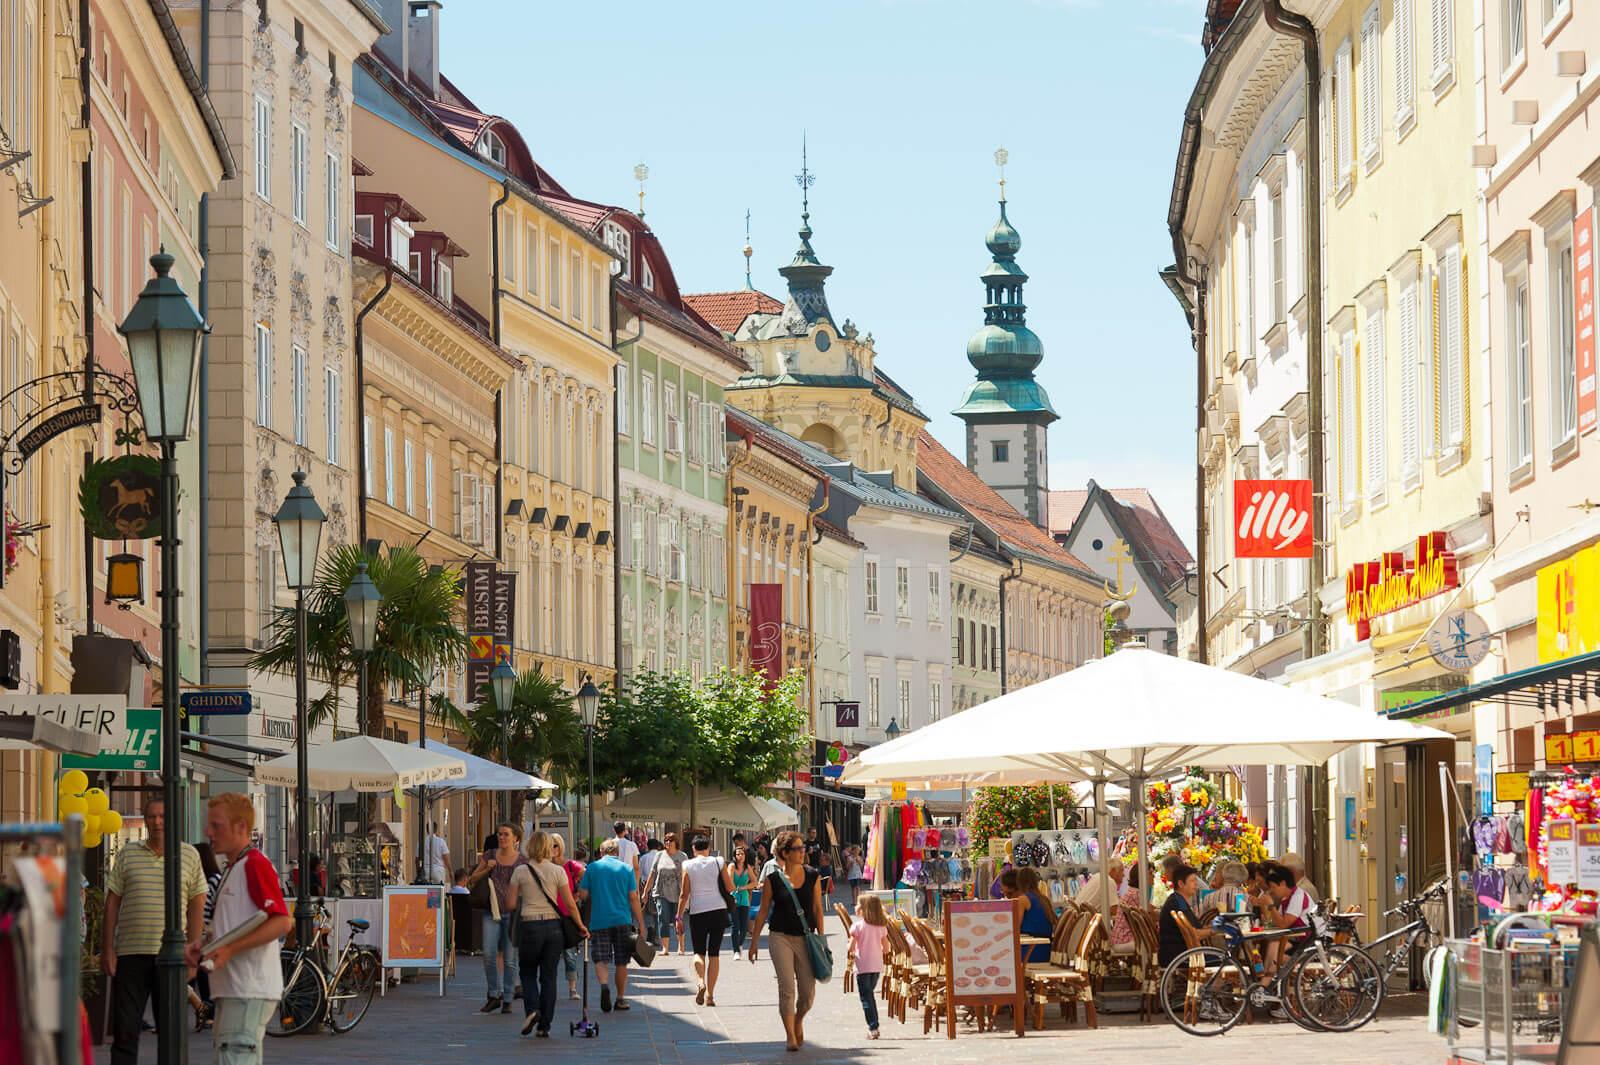 Улица города Клагенфурт